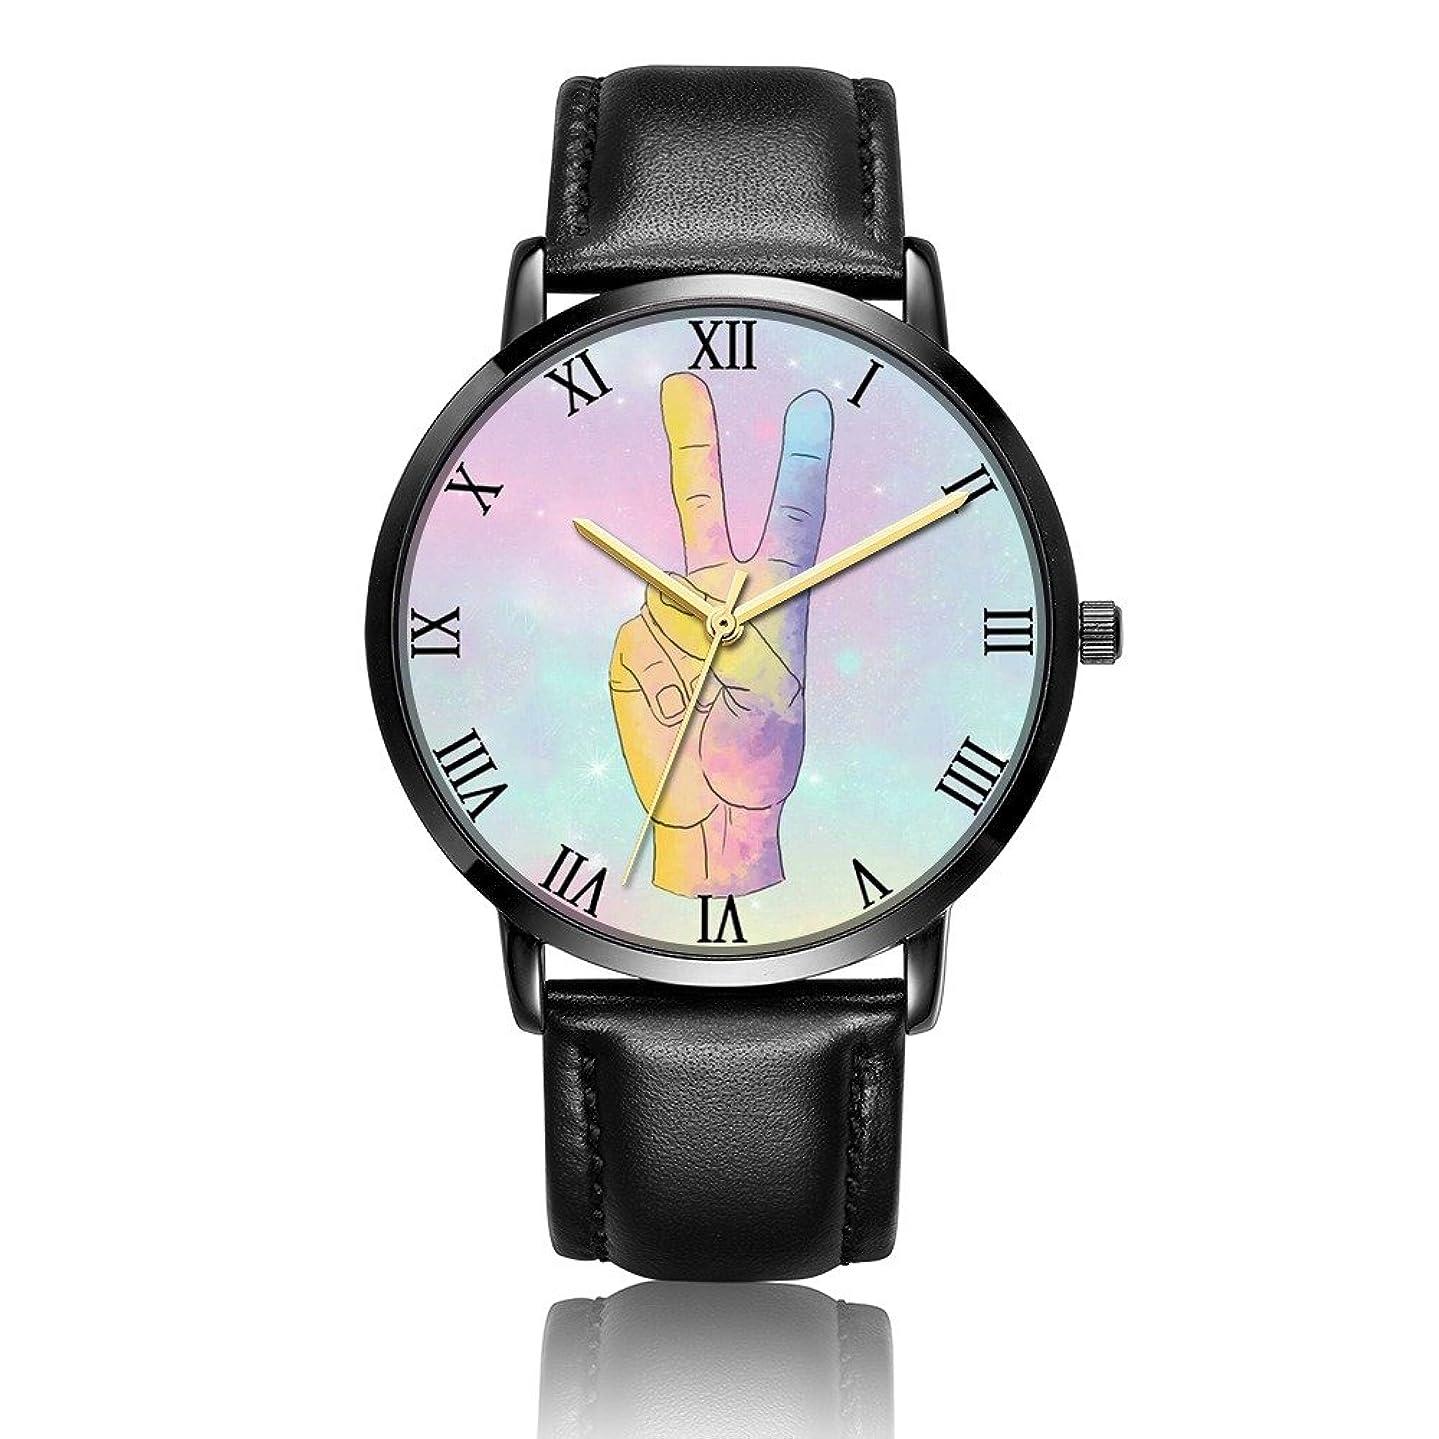 Whiterbunny Customized Hand Peace Sign Galaxy Wrist Watch Unisex Analog Quartz Fashion PU Leather Bracelet Wristwatch for Women and Men